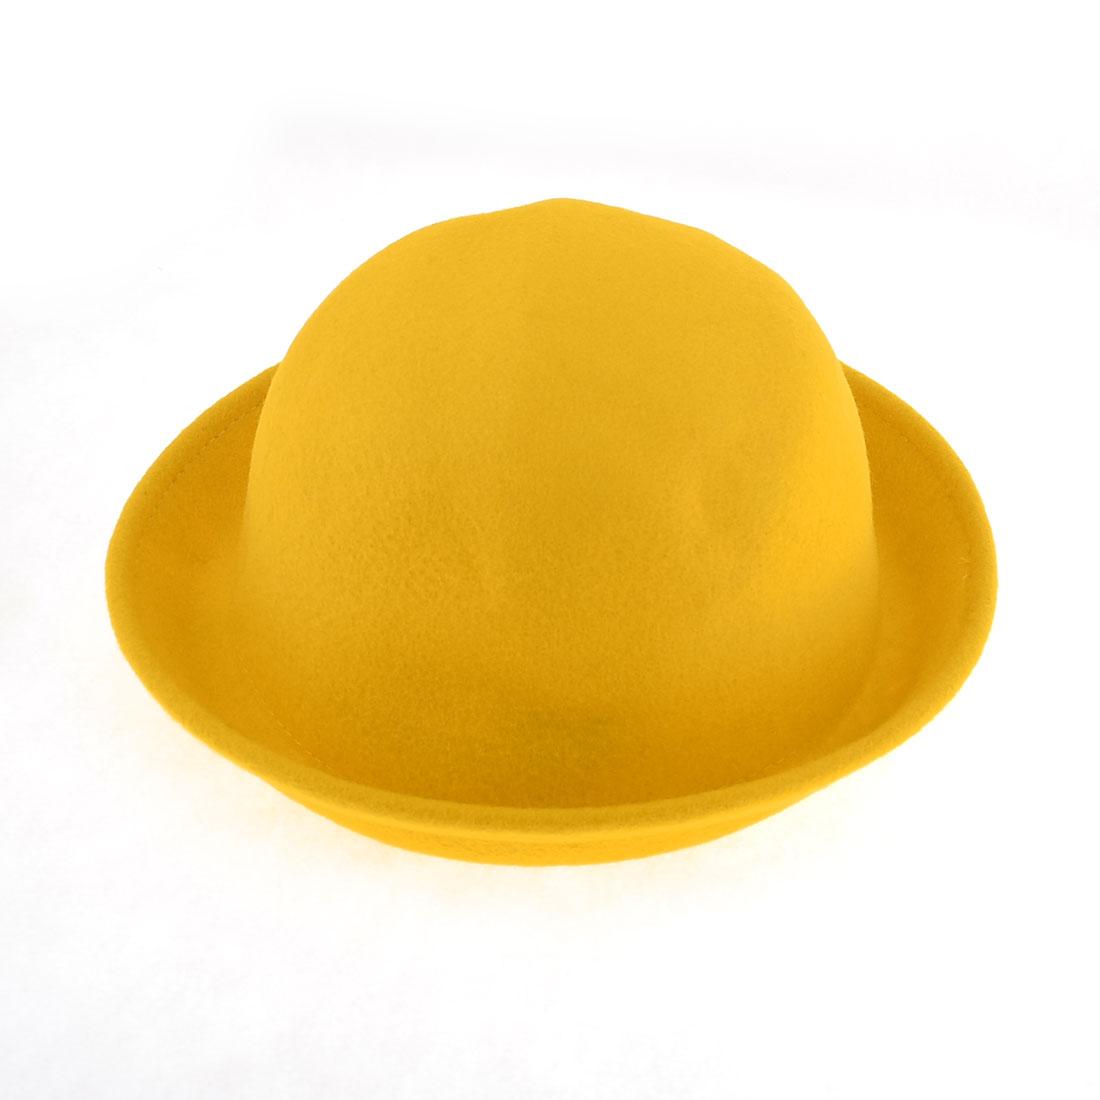 Ladies Autumn Winter Korea Style Solid Yellow Fedora Hat Cap Size M